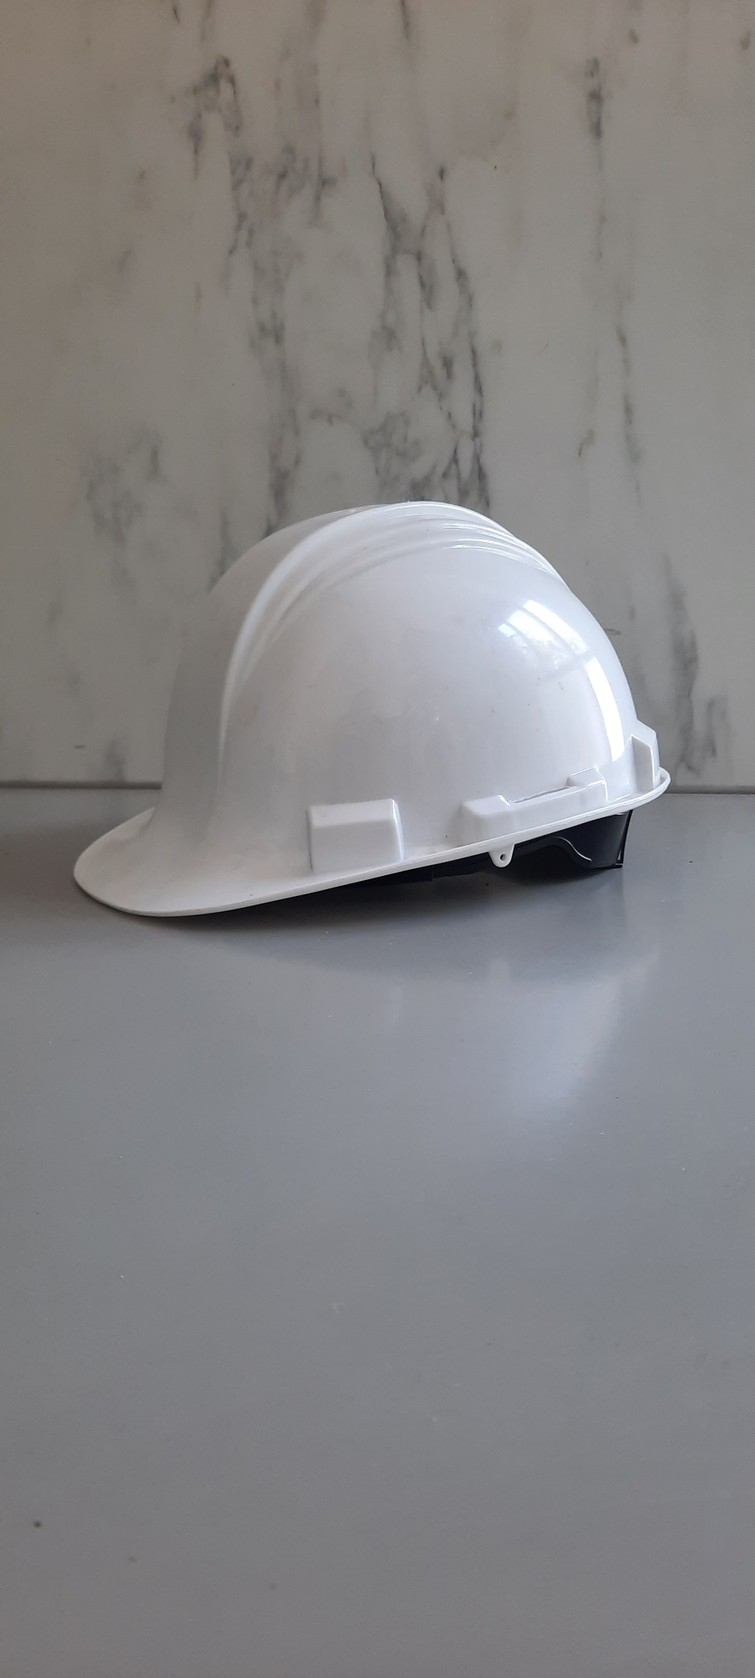 Witte bouwhelm veiligheidshelm North - one size